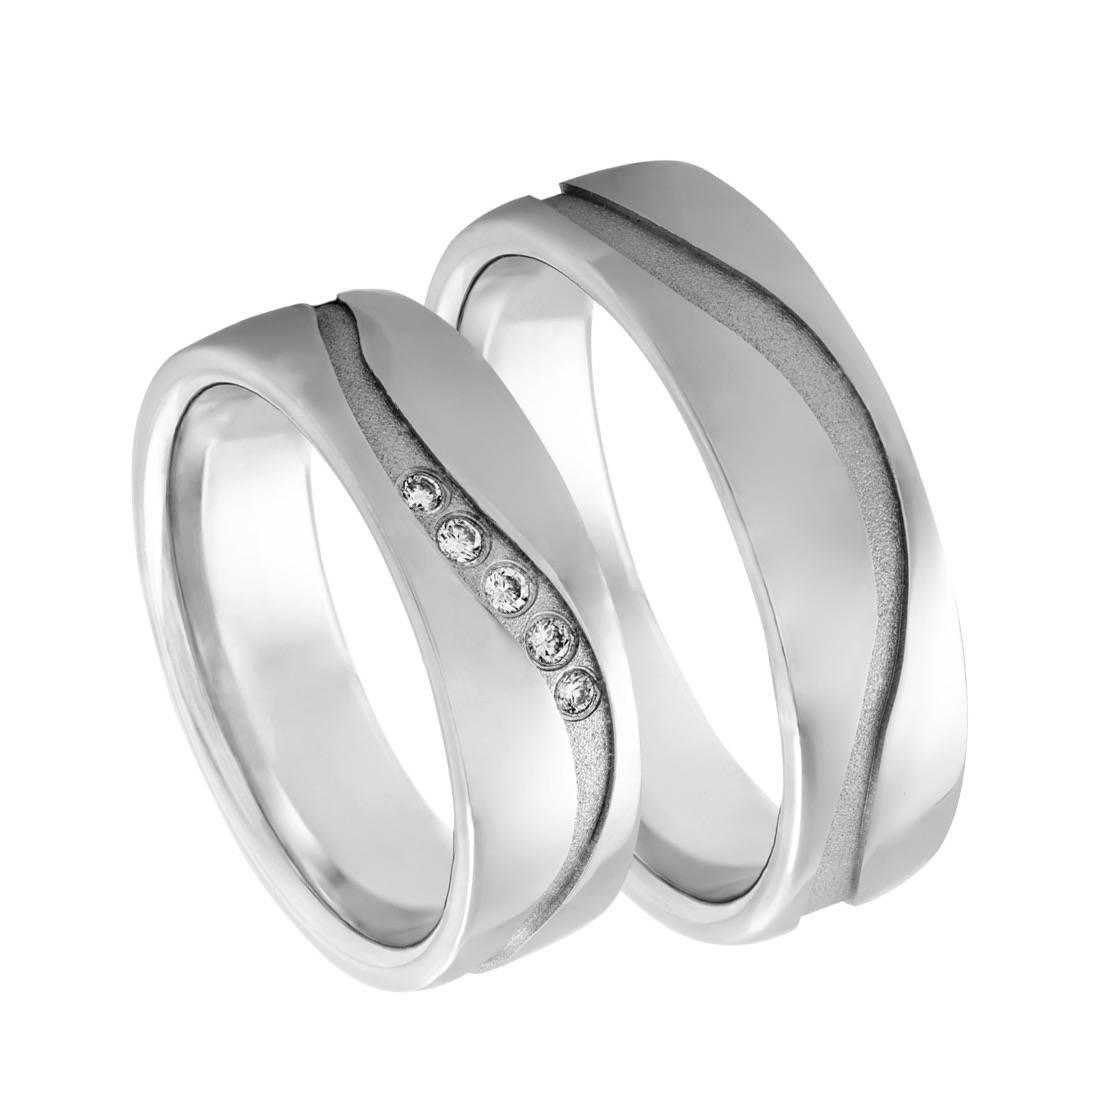 Juwelier Jan Maes - Trouwringen - Verlovingsringen - Juwelen - House of Weddings - 8